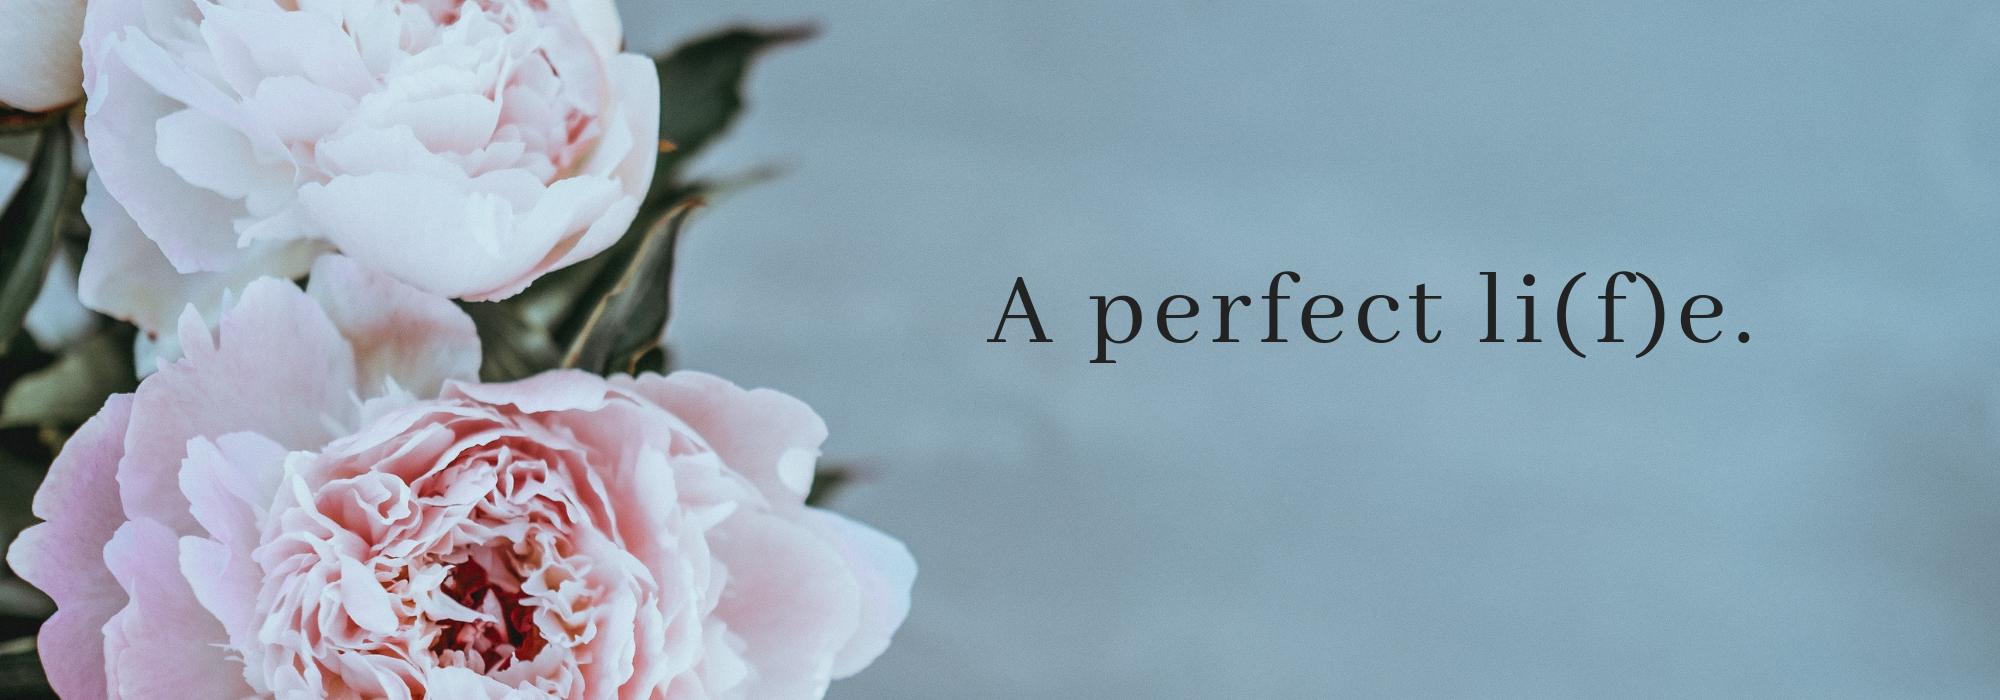 A perfect li(f)e